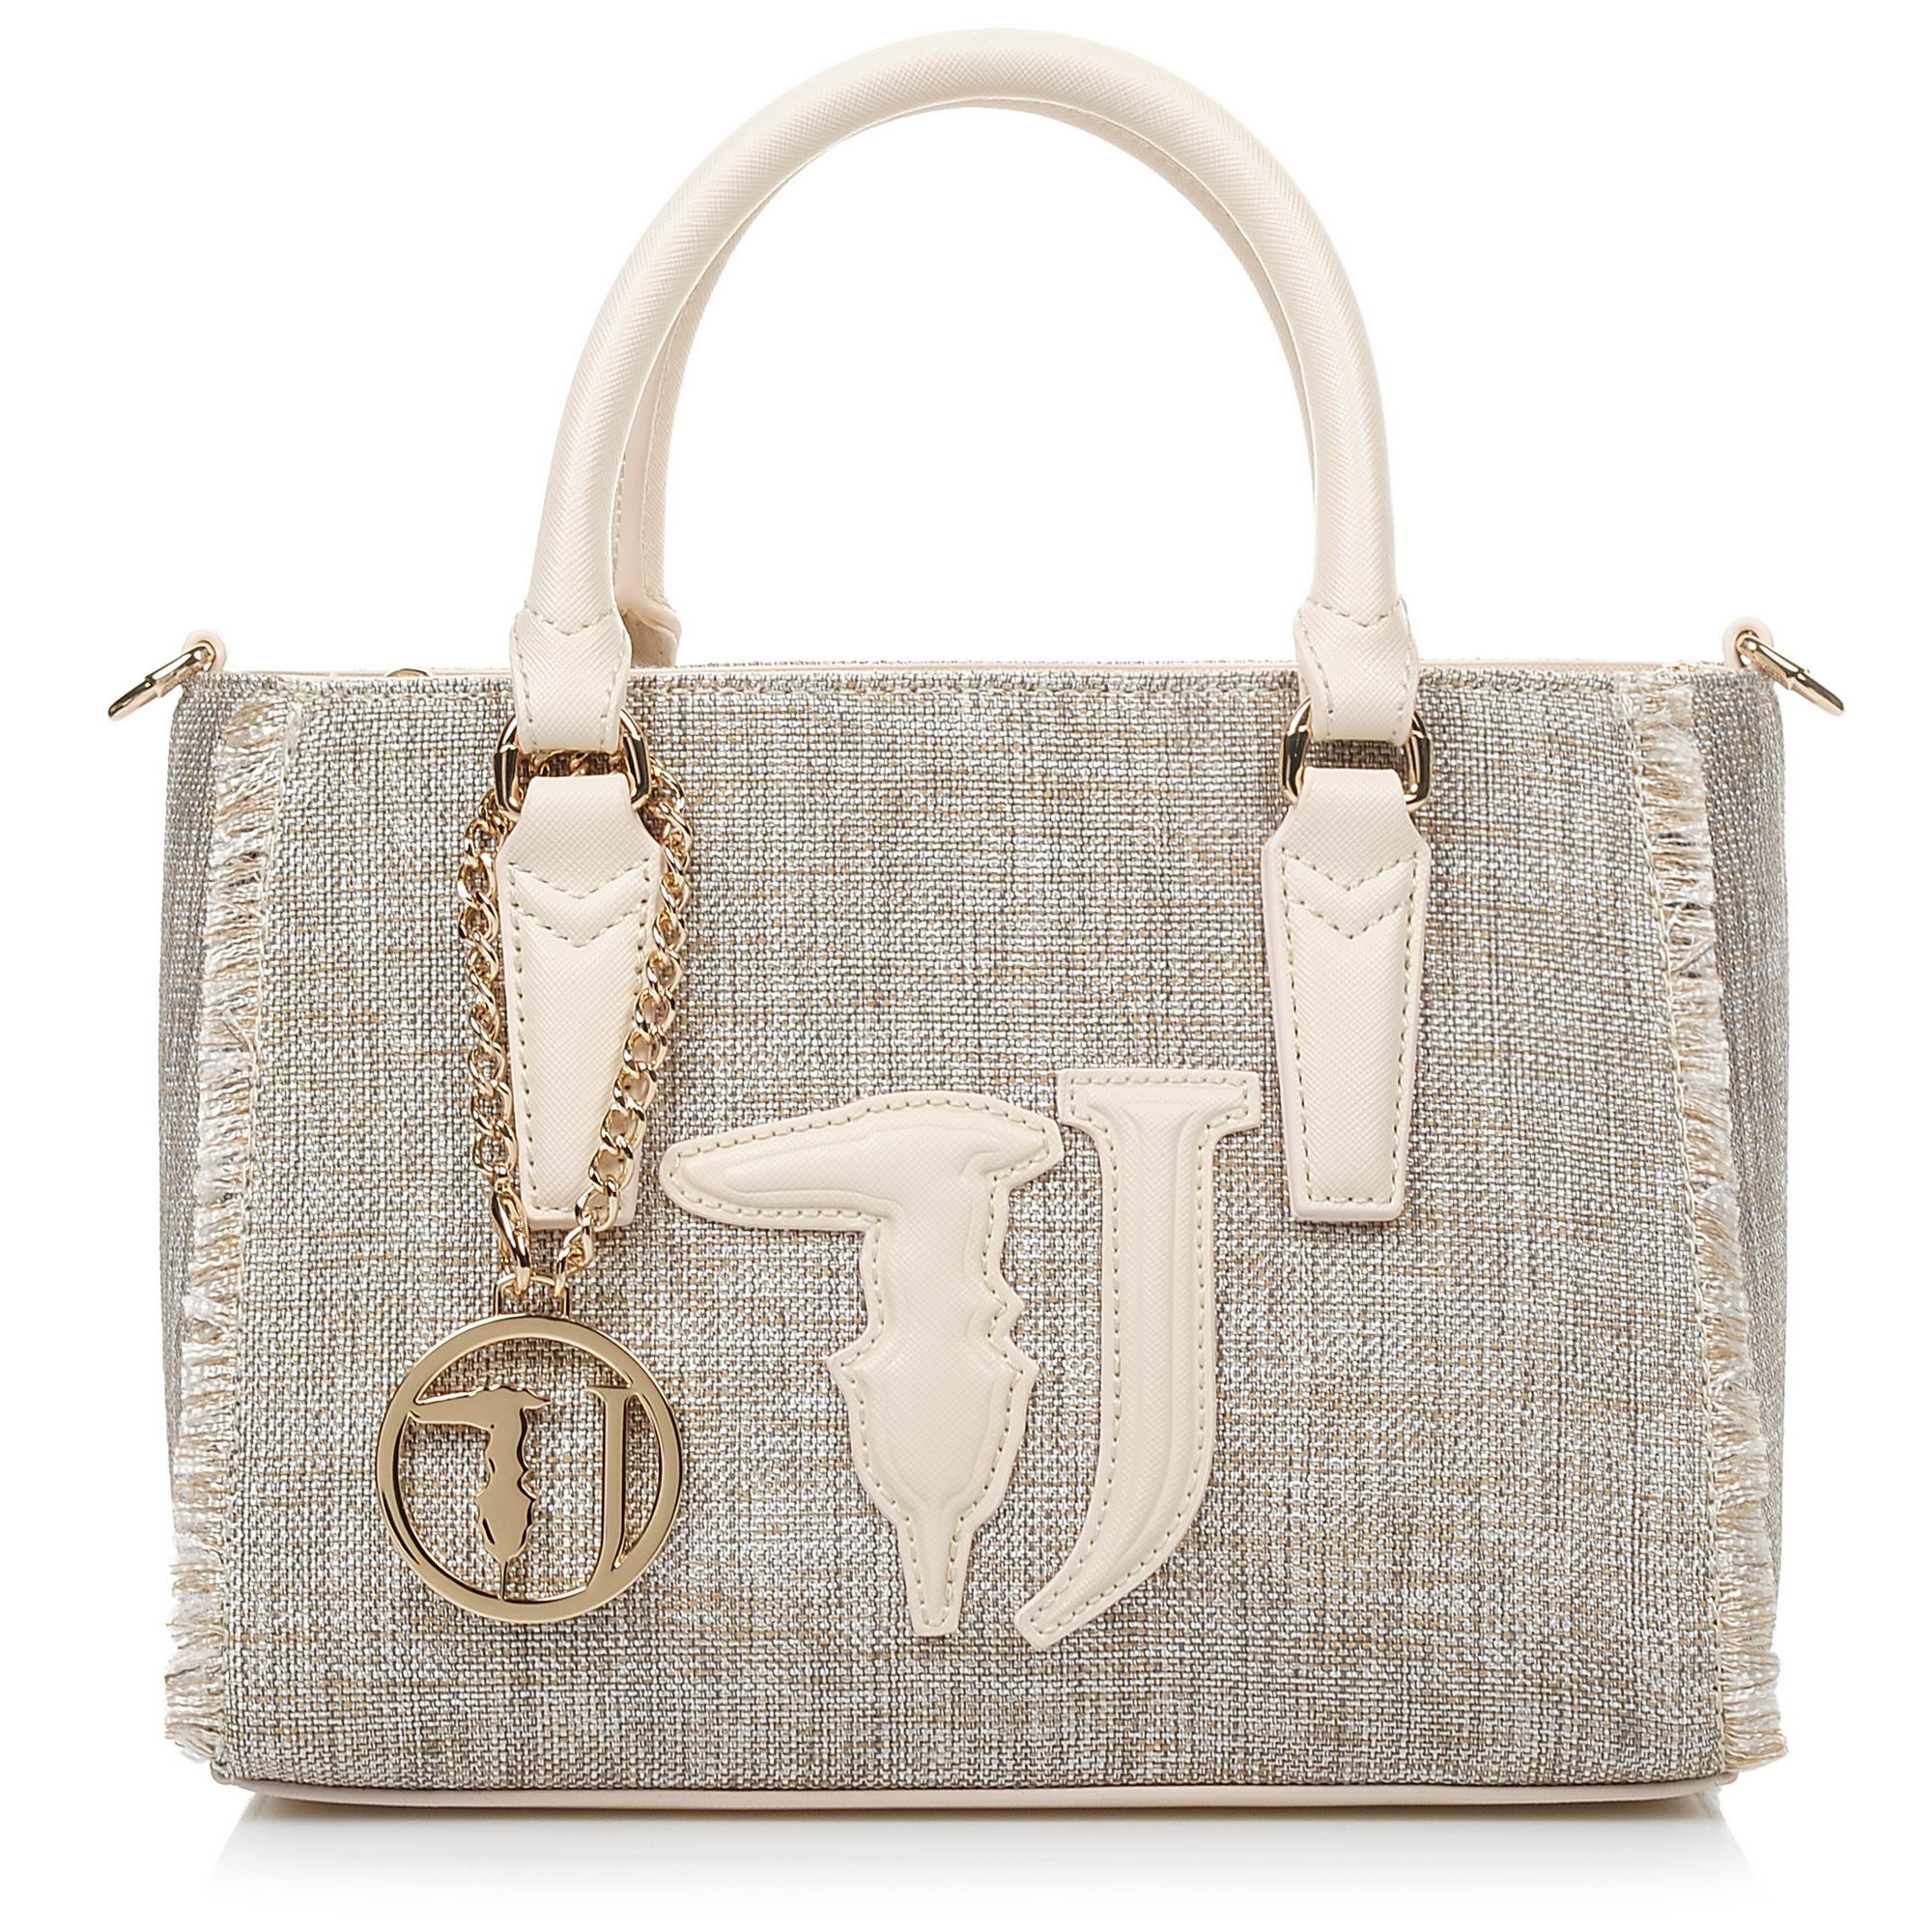 Tote Τσαντάκι Trussardi Jeans Ischia Textil Mini Bag 75B00180 γυναικα   γυναικεία τσάντα